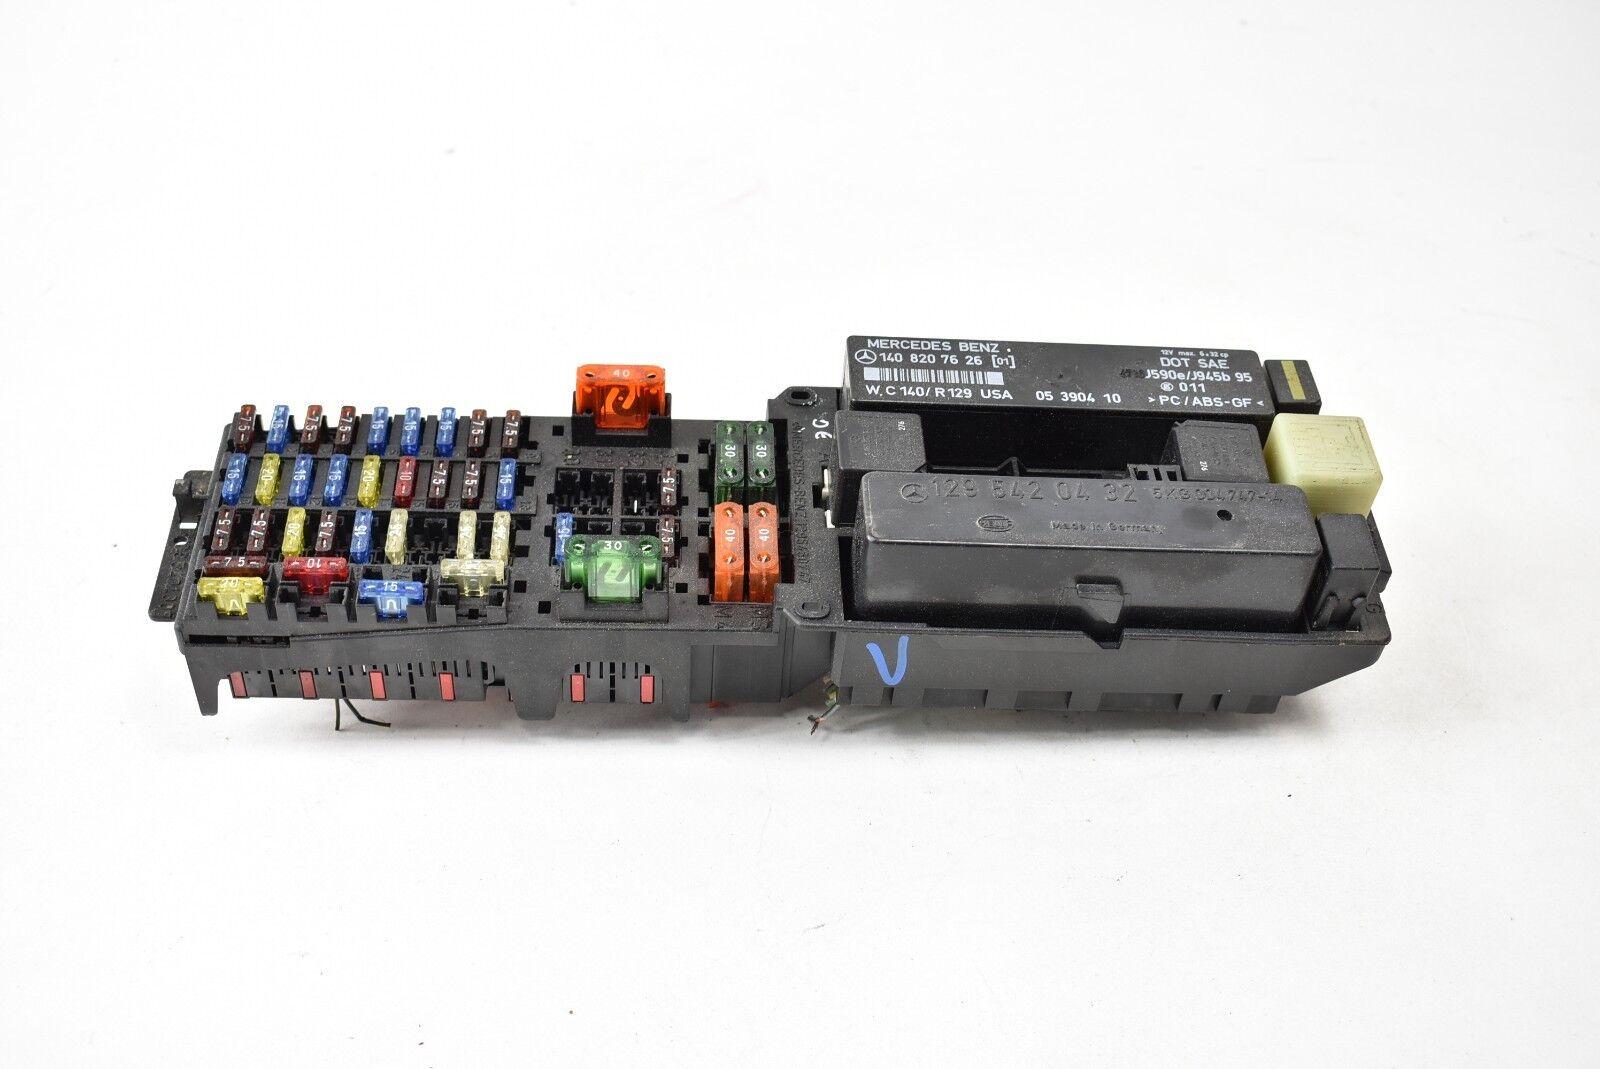 R129 fuses